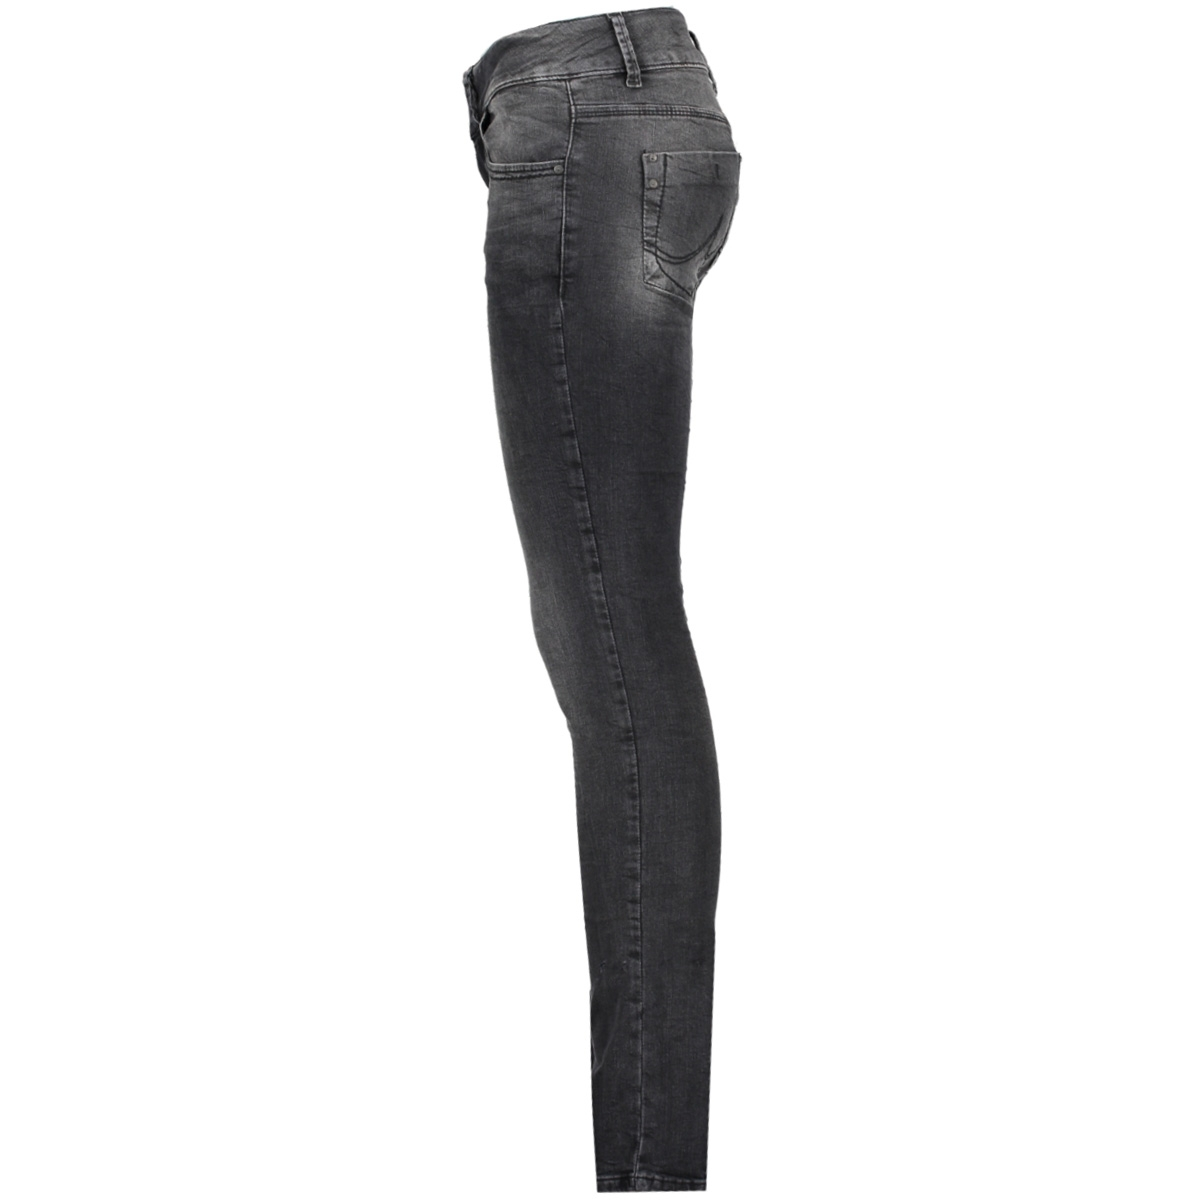 100950982.13775 molly ltb jeans vista black